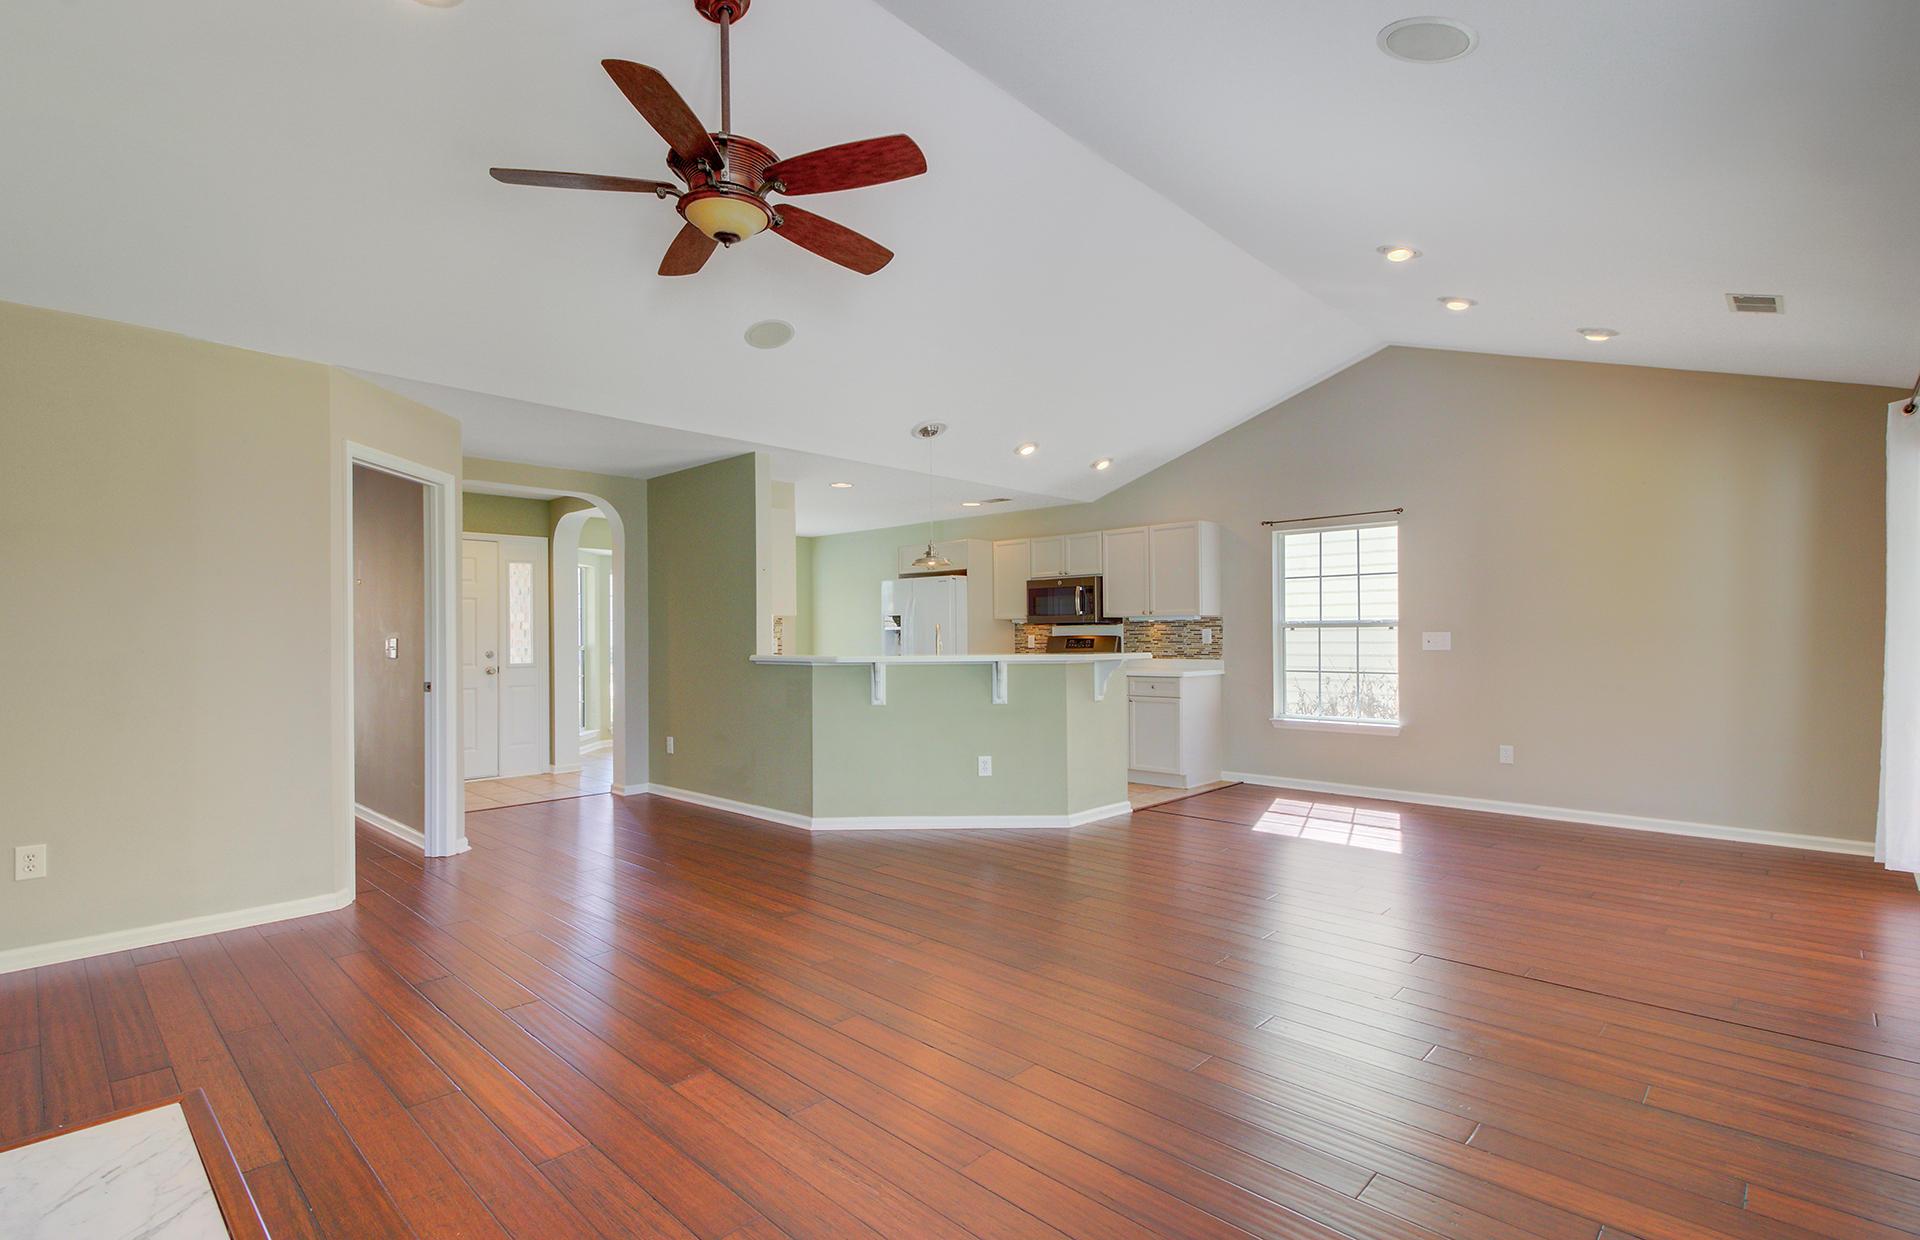 Grand Oaks Plantation Homes For Sale - 789 Bent Hickory, Charleston, SC - 7